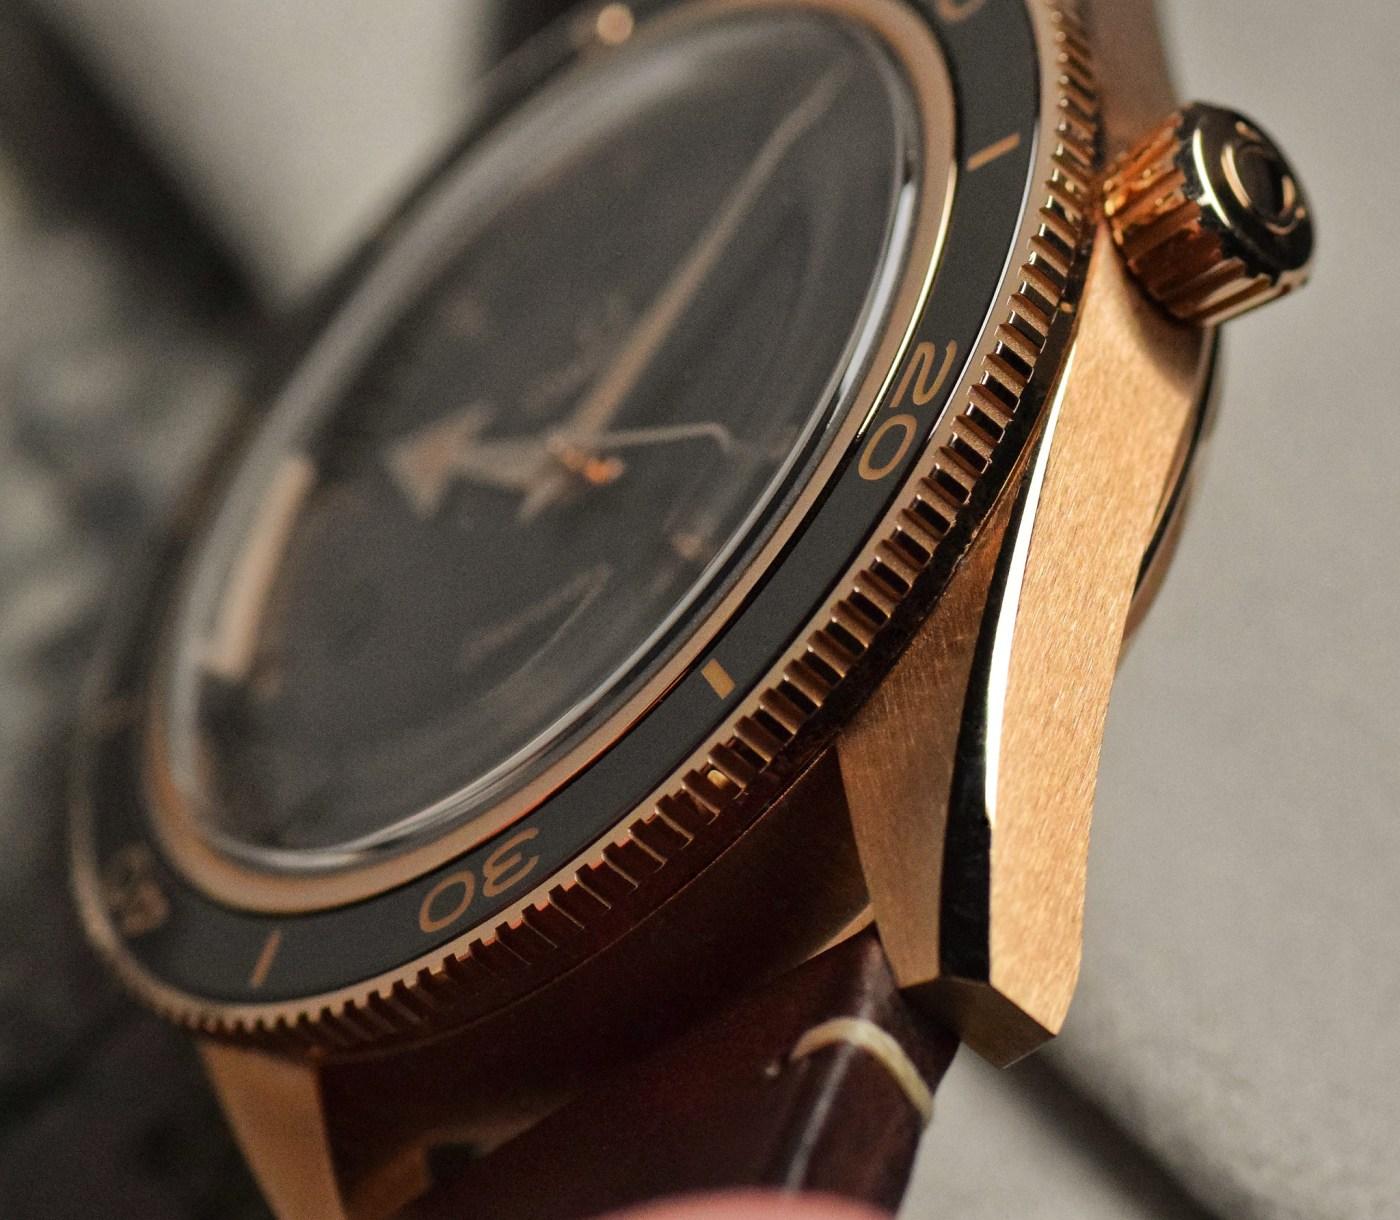 Omega Seamaster 300 Co-Axial Master Chronometer Bronze Gold 234.92.41.21.10.001